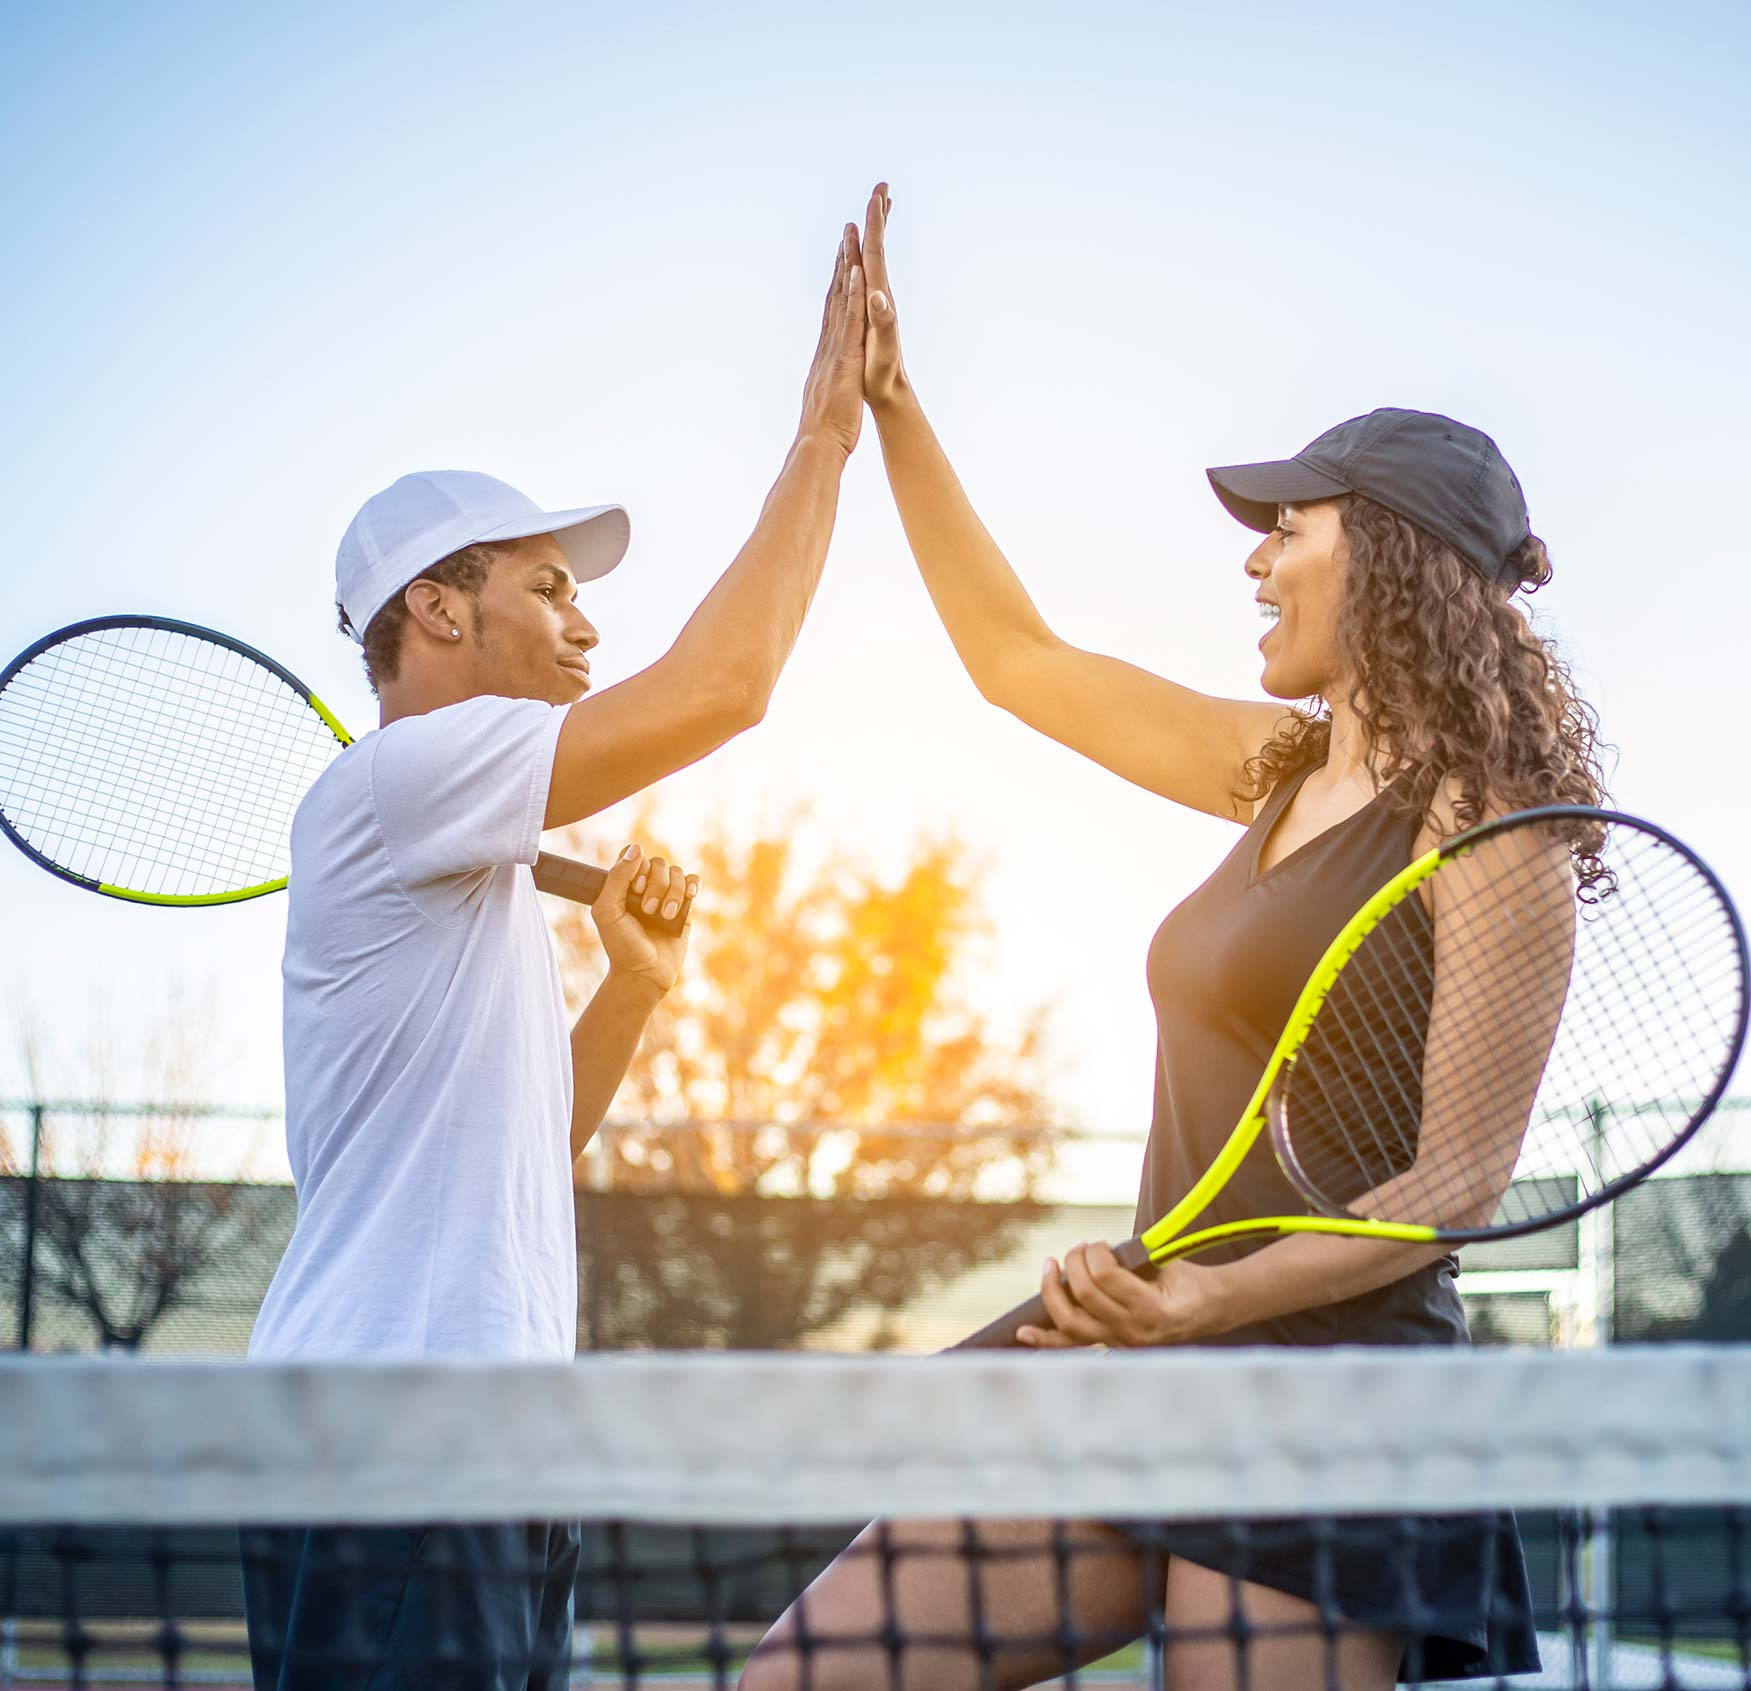 https://www.pasjessysteem.nl/wp-content/uploads/2021/07/gebruiksvriendelijke-beveiliging-tennisparken-toegangscontrole.jpg